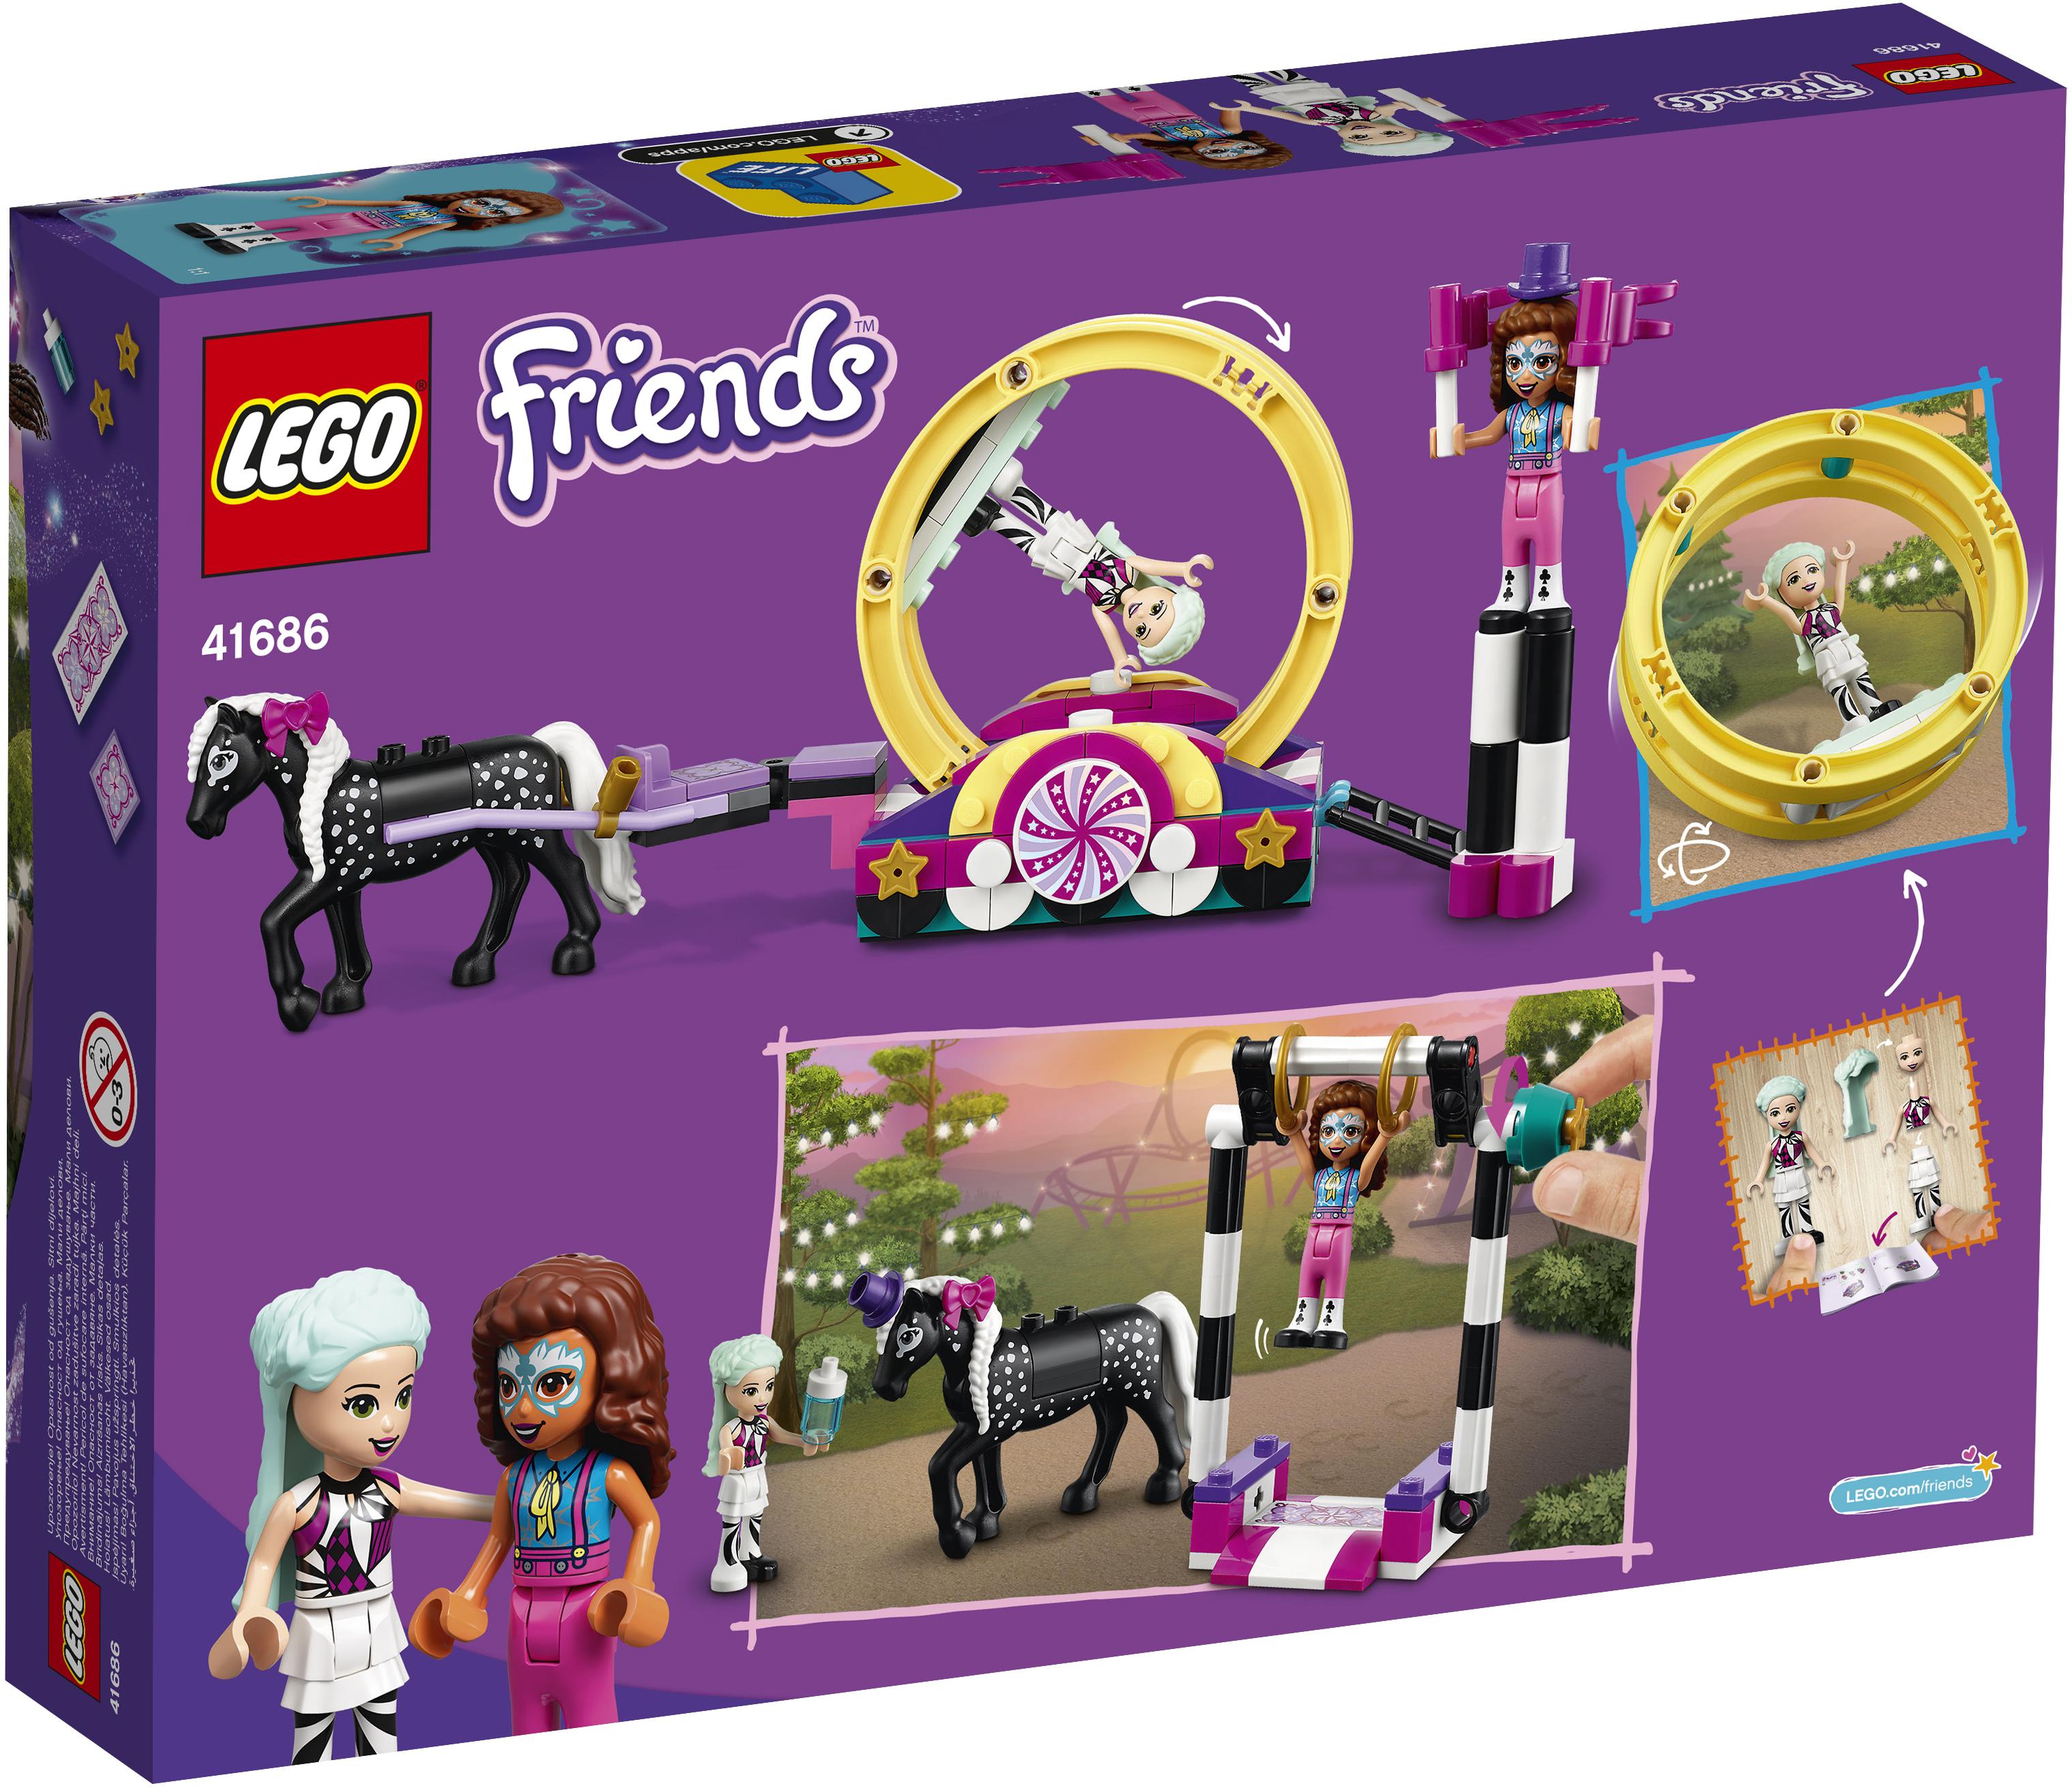 LEGO Friends Magisk akrobatik - 41686